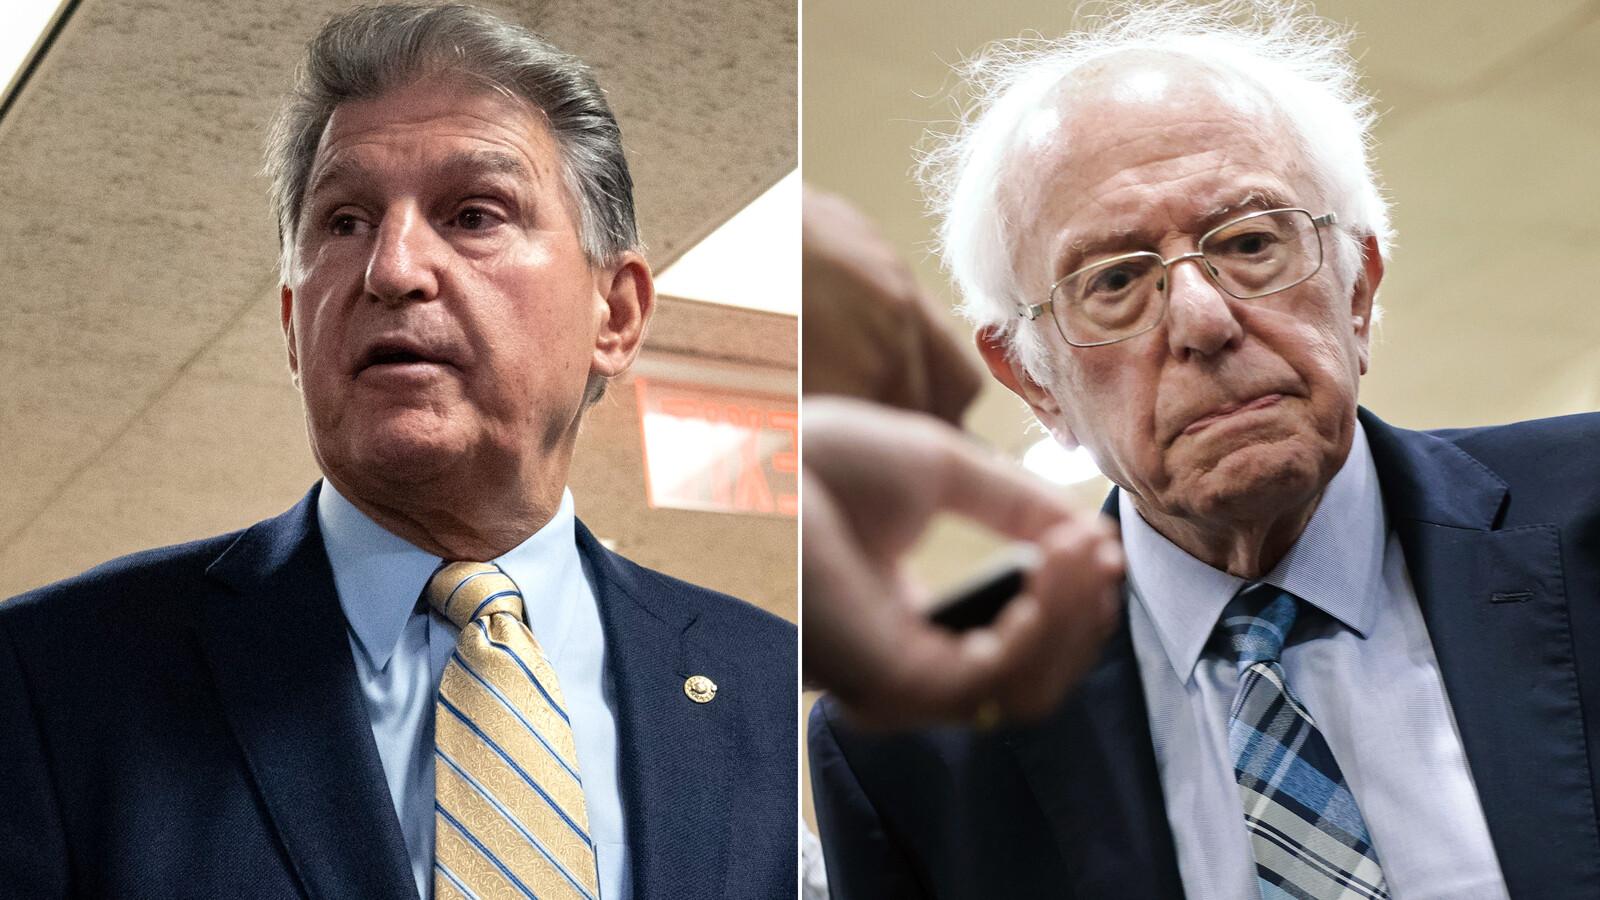 Inside the Manchin-Sanders feud that has Democrats nervous about Biden's agenda